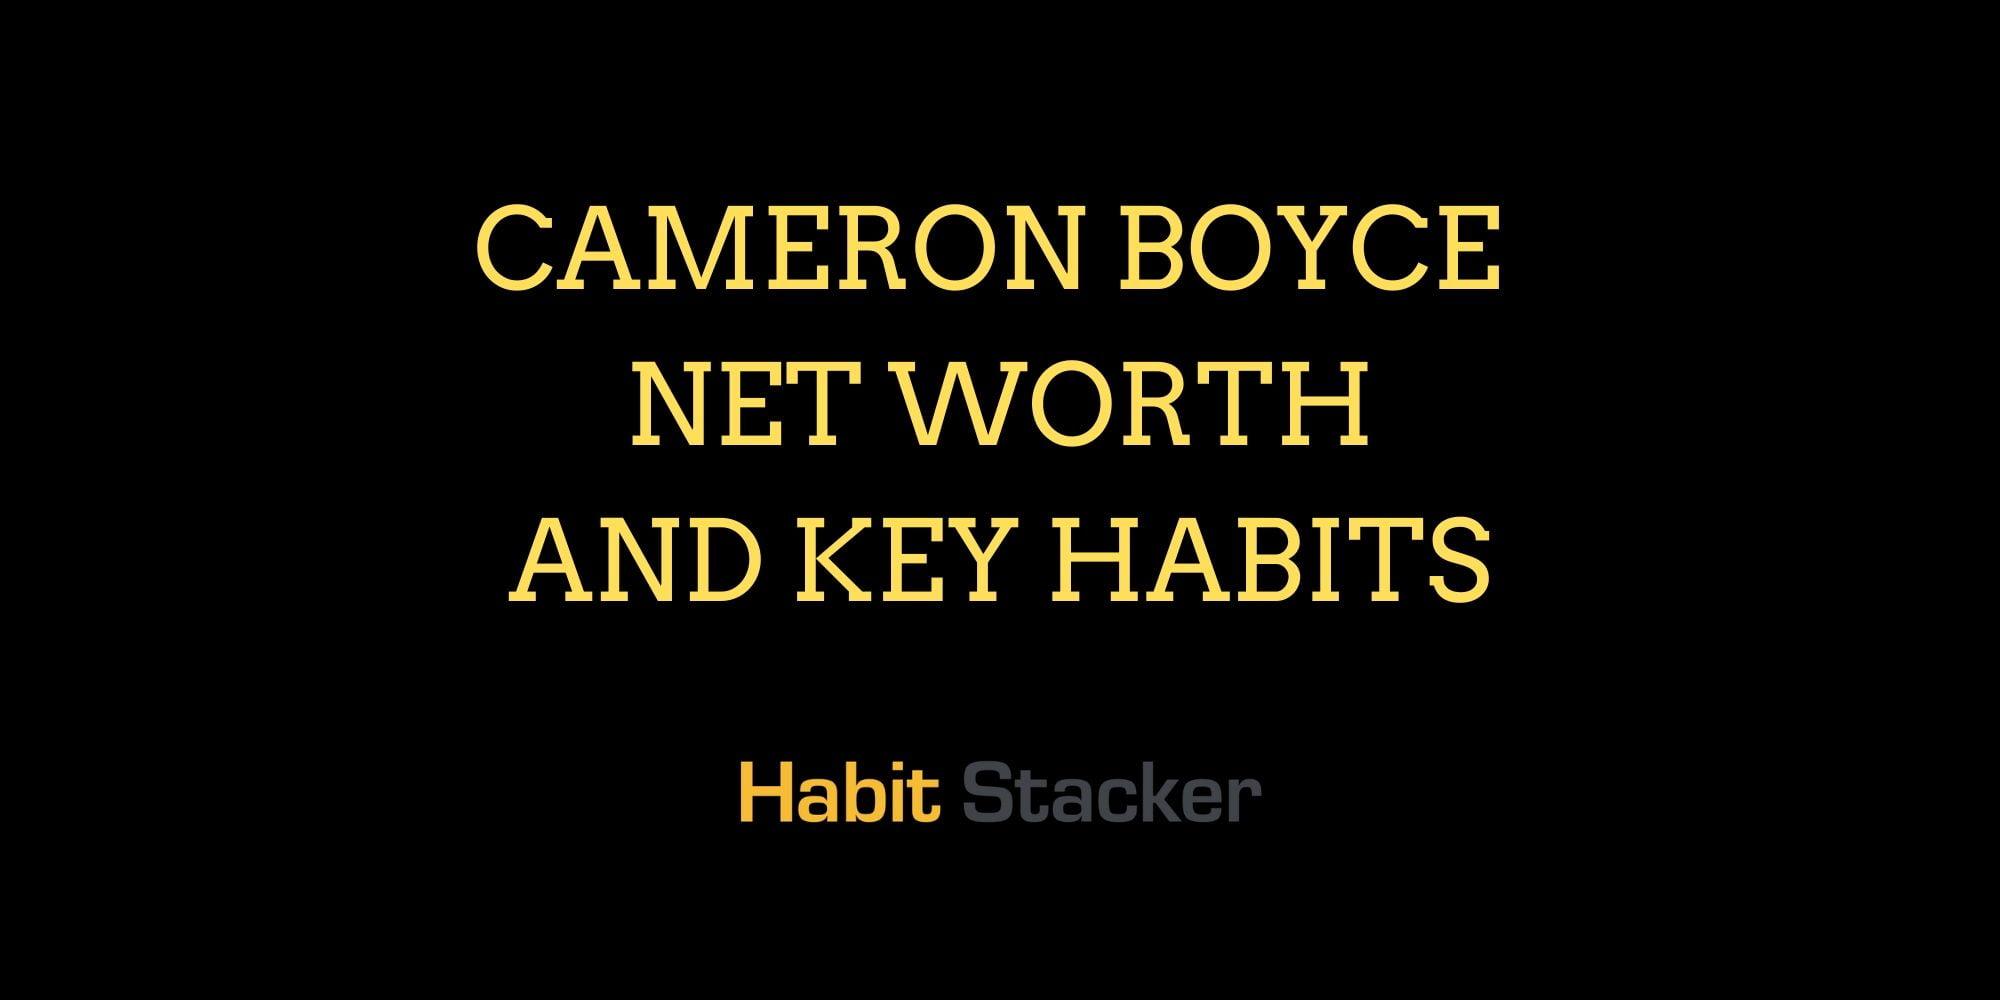 Cameron Boyce Net Worth And Key Habits Habit Stacker